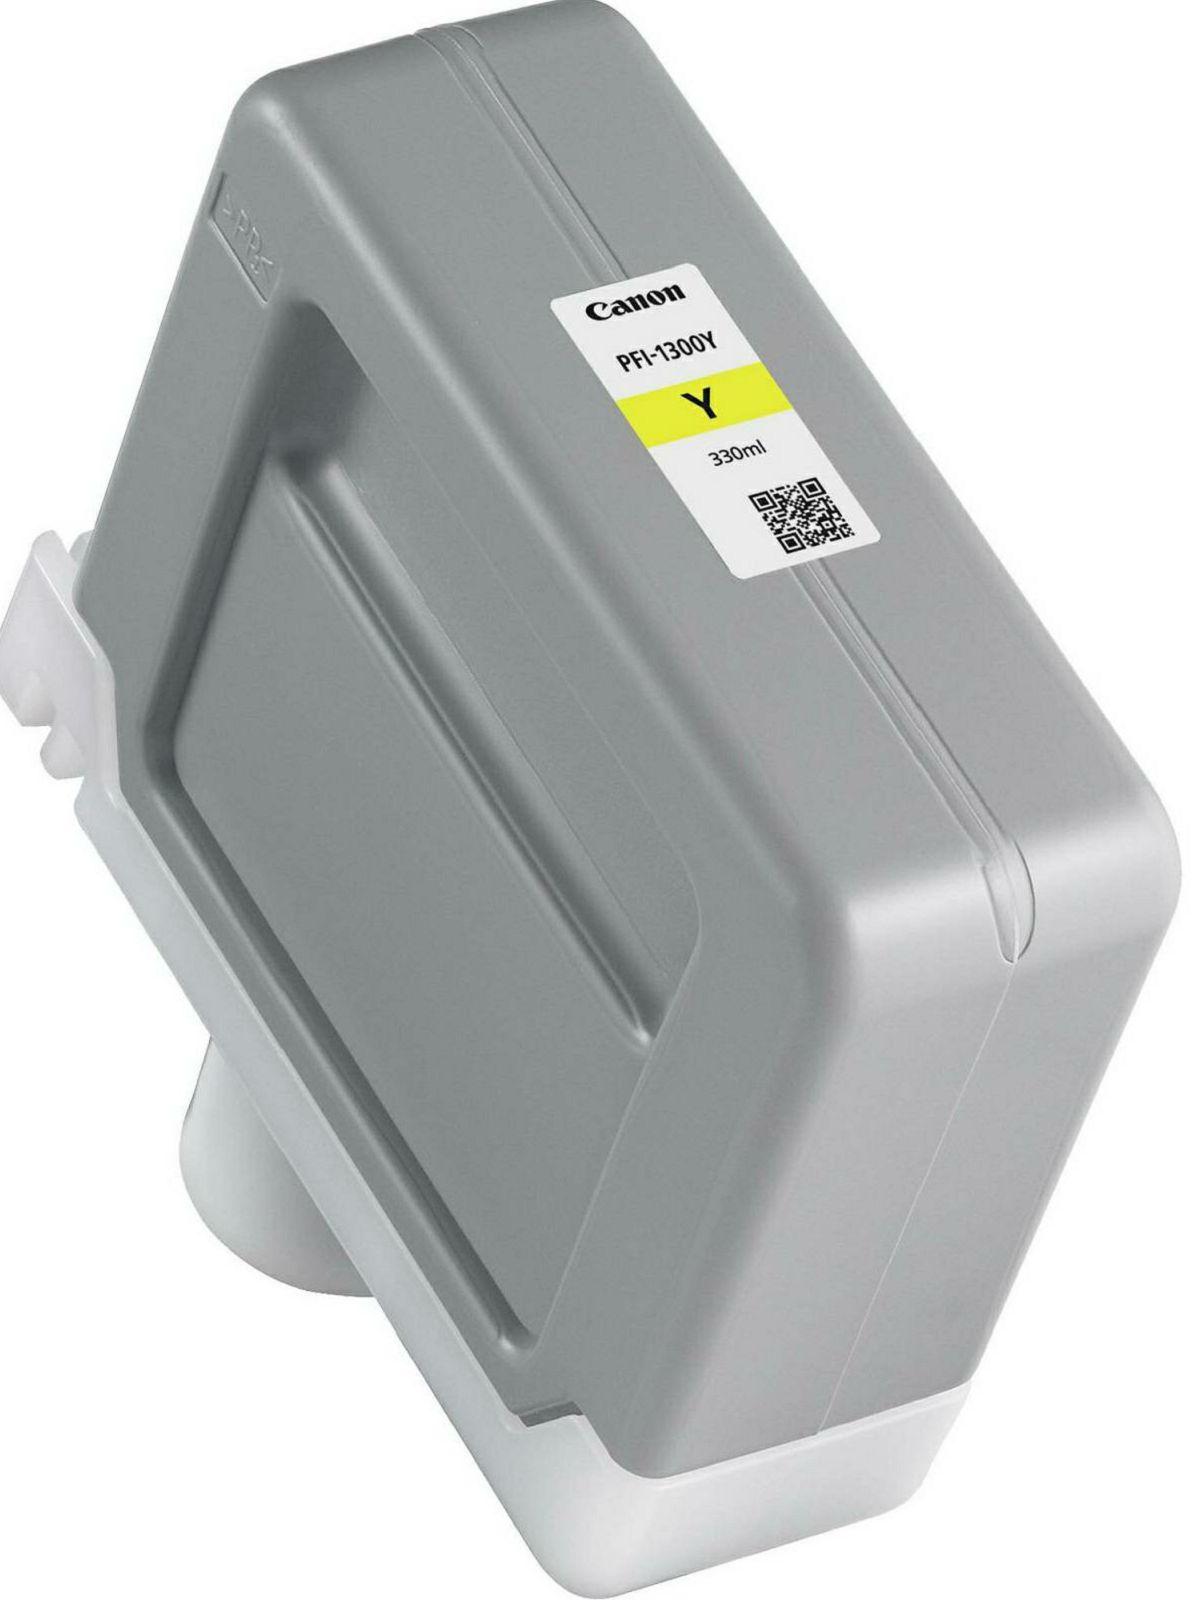 Canon Pigment Ink Tank PFI-1300 Yellow 330ml PFI1300Y žuta tinta za ploter imagePROGRAF PRO-2000, PRO-4000, PRO-4000S, PRO-6000, PRO-6000S Large-Format Printers (0814C001AA)